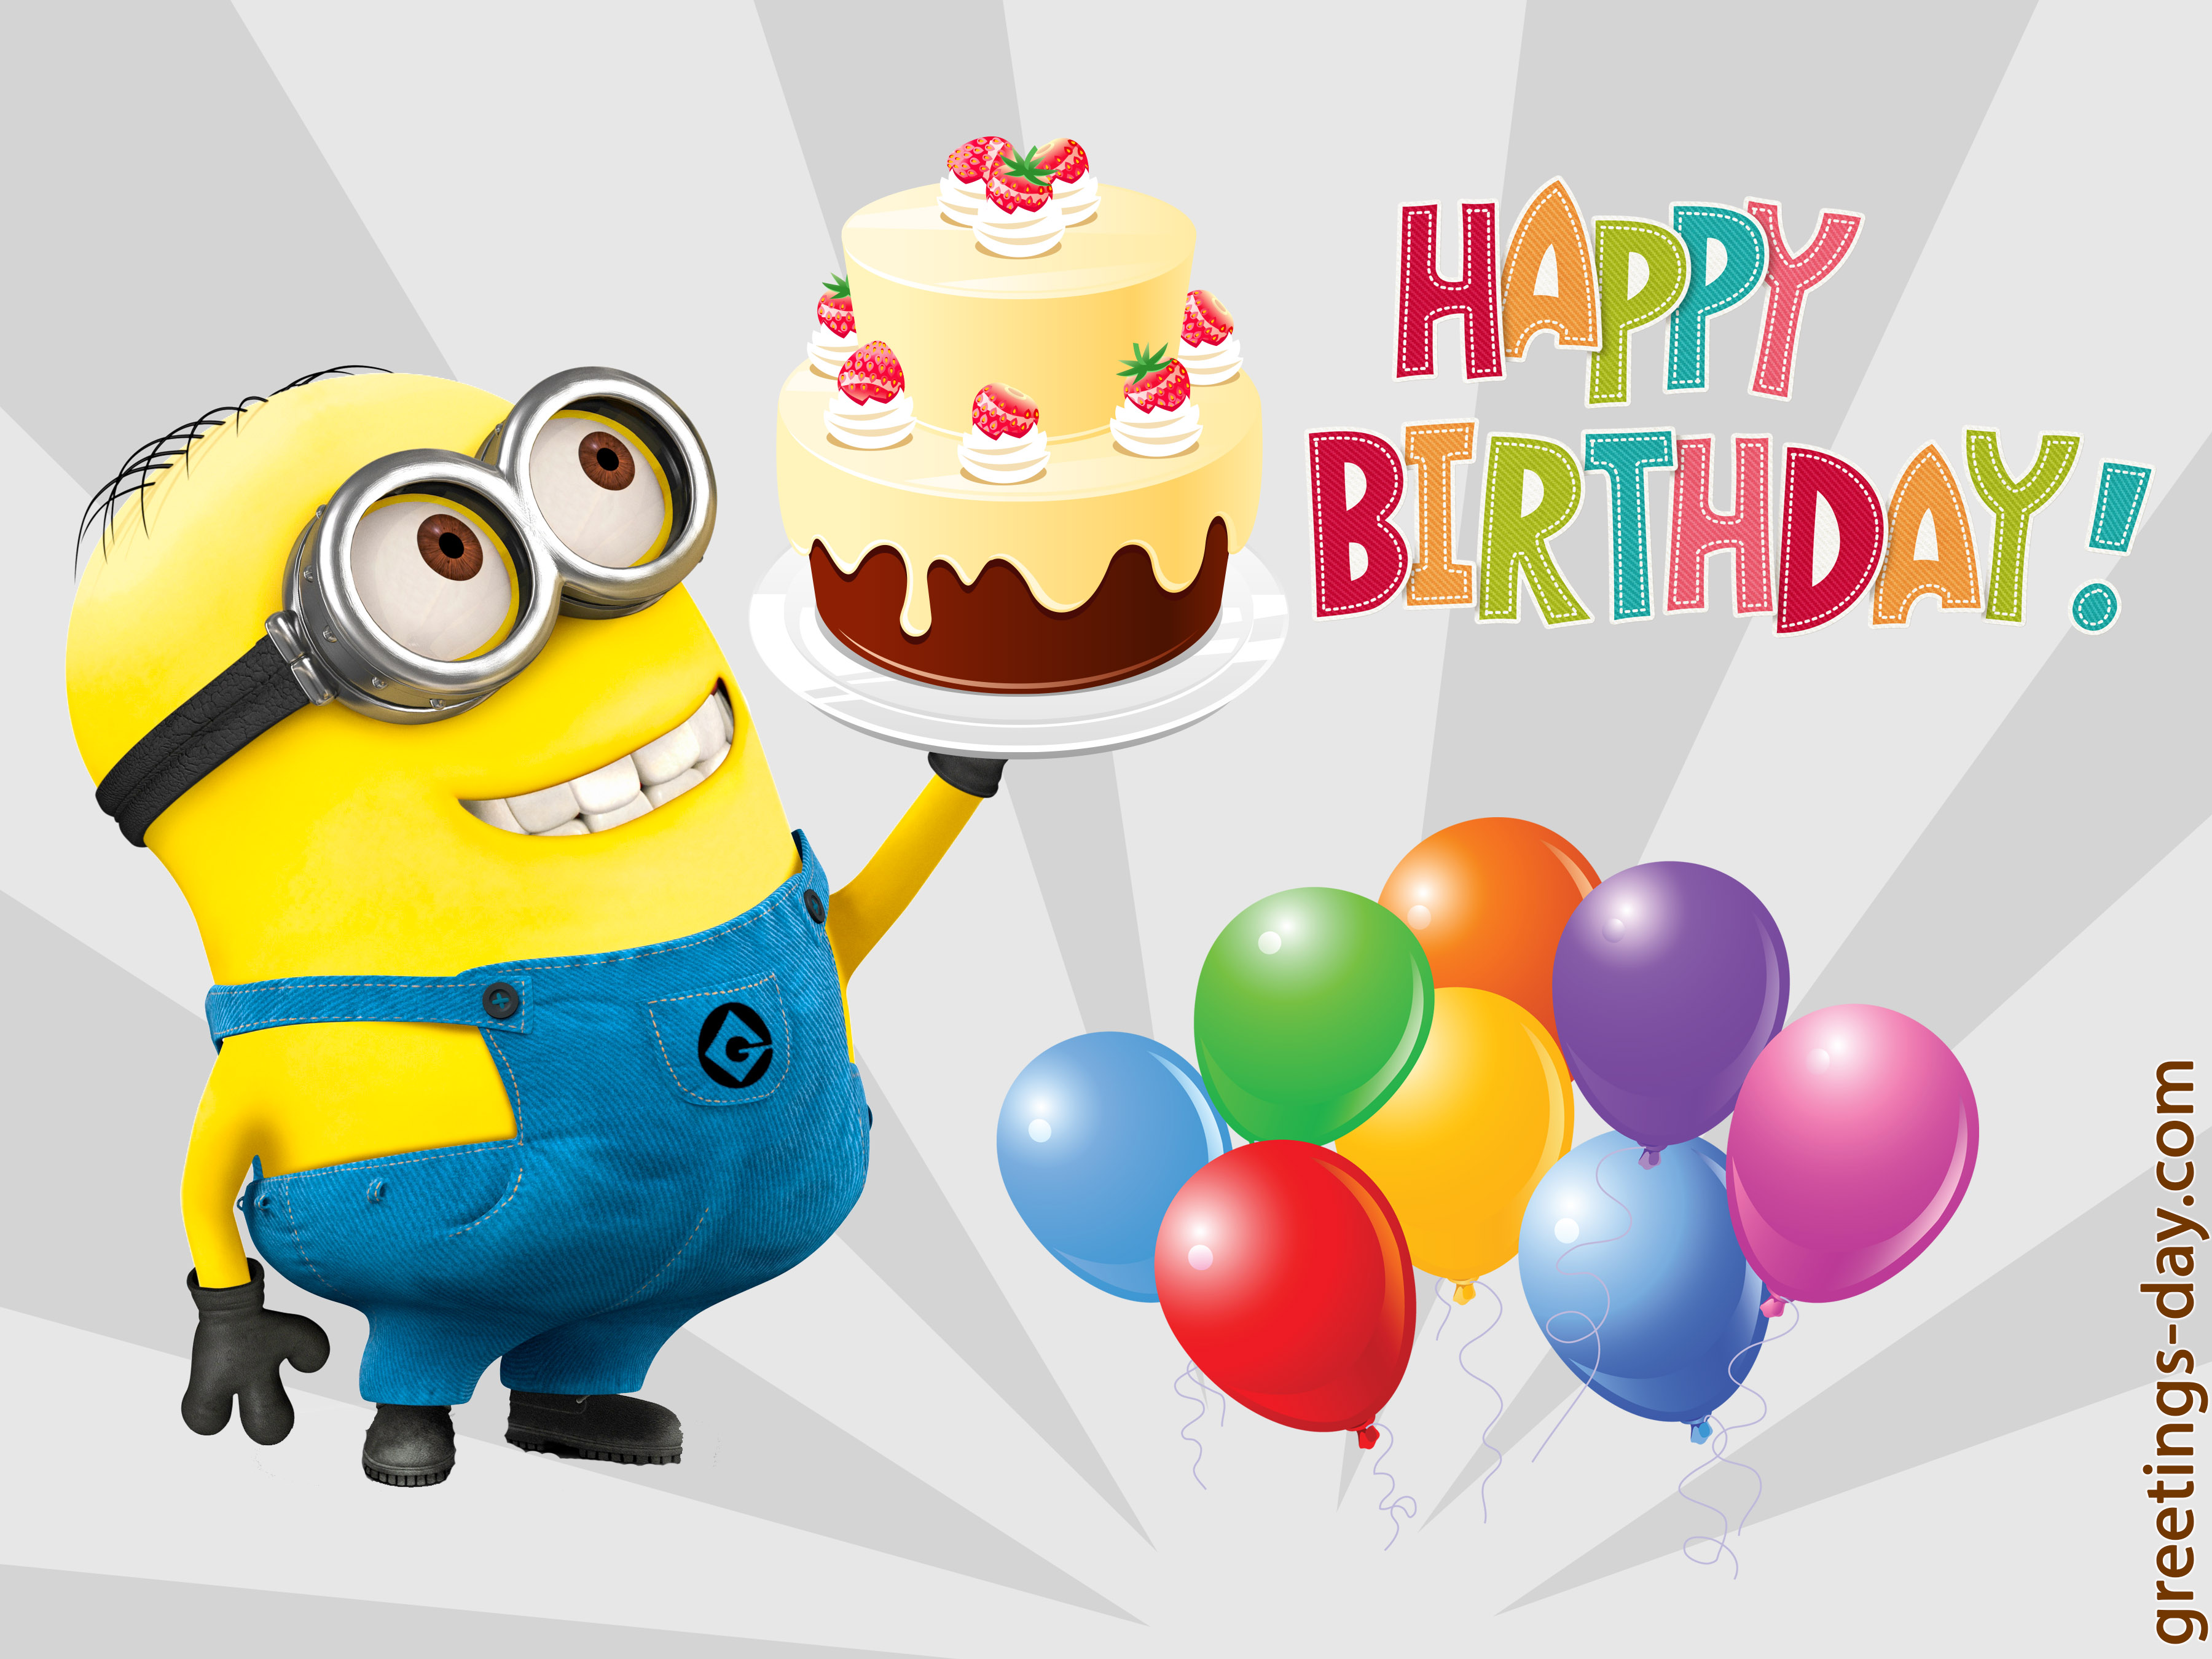 Happy birthday raquel herrera organocatalisis asimtrica group happy birthday card 23 06 17 bookmarktalkfo Gallery